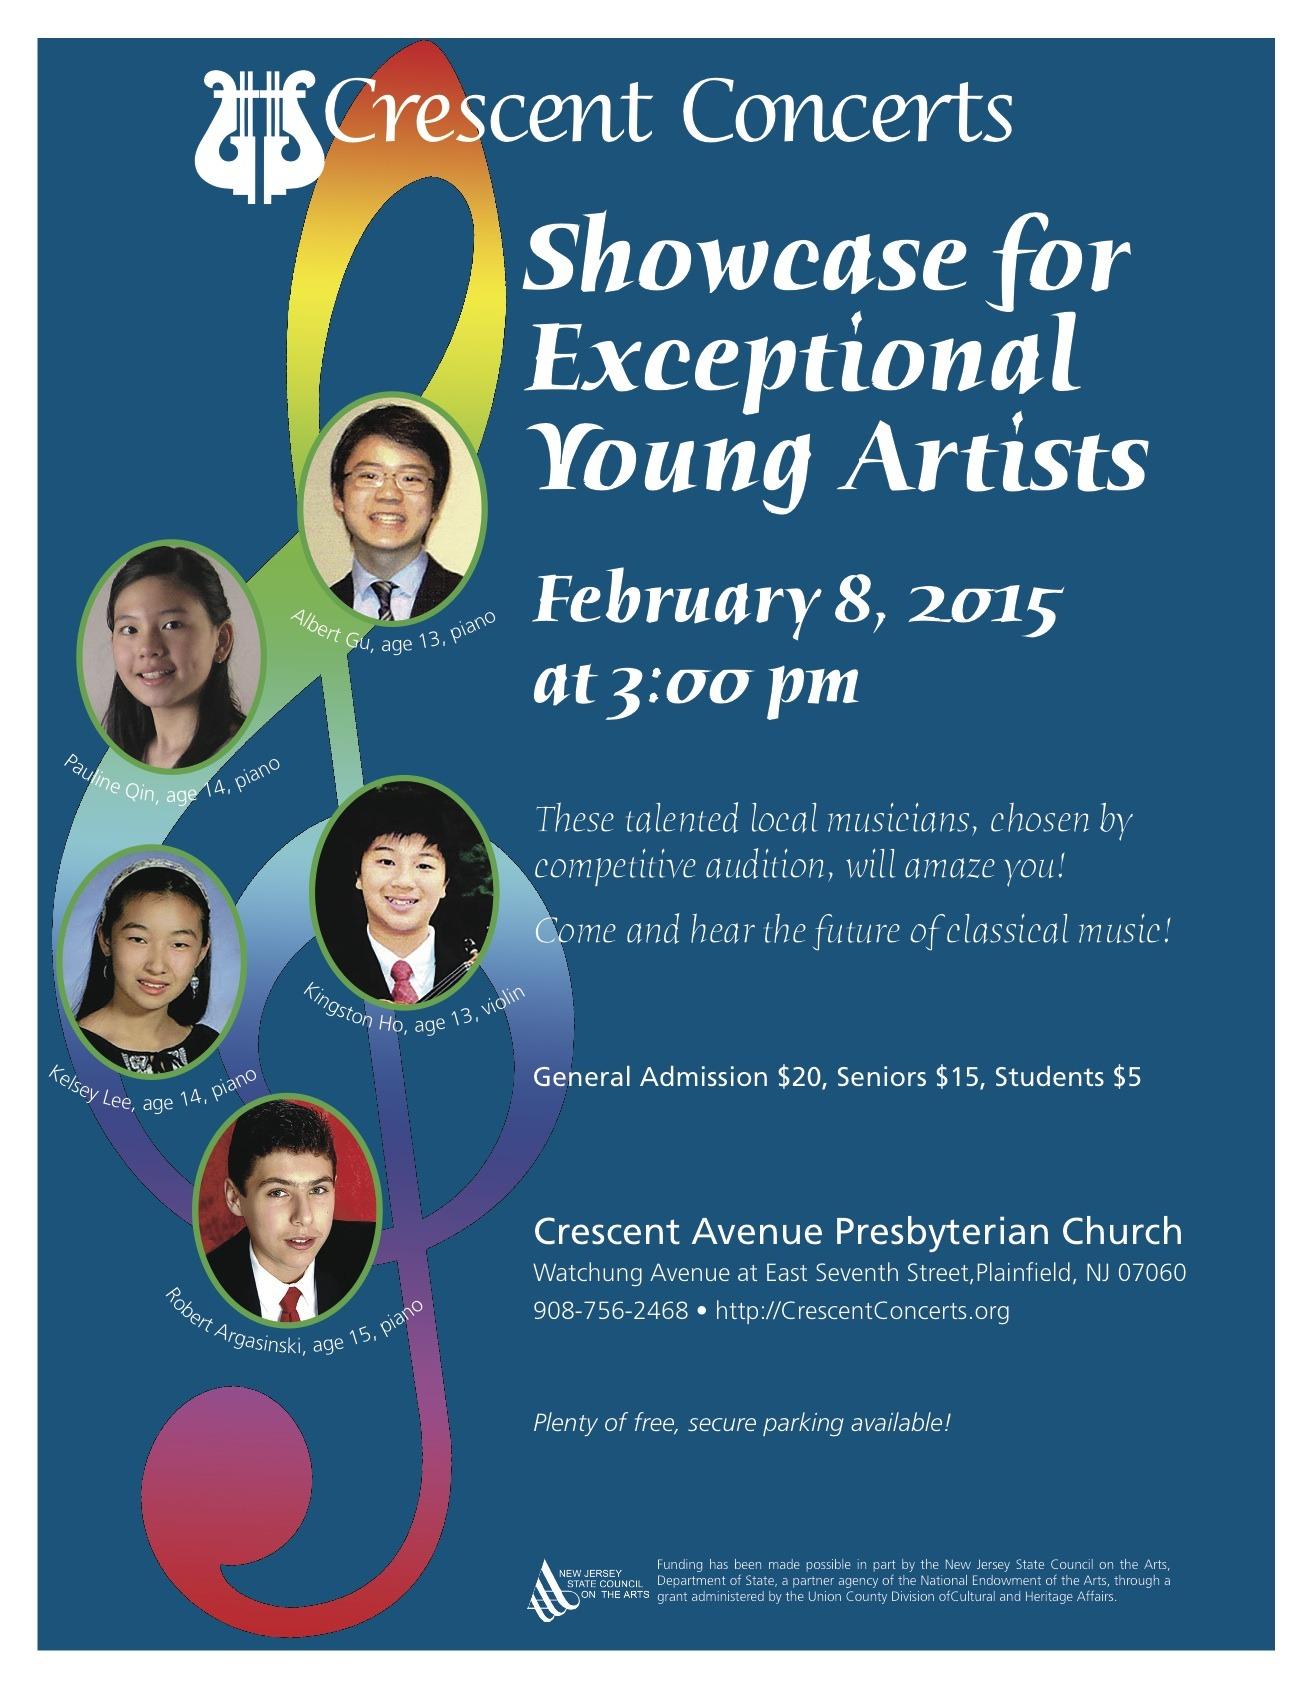 6dac298fcbc492b314de_Showcase_for_Exceptional_Young_Artists__Feb._8.jpg